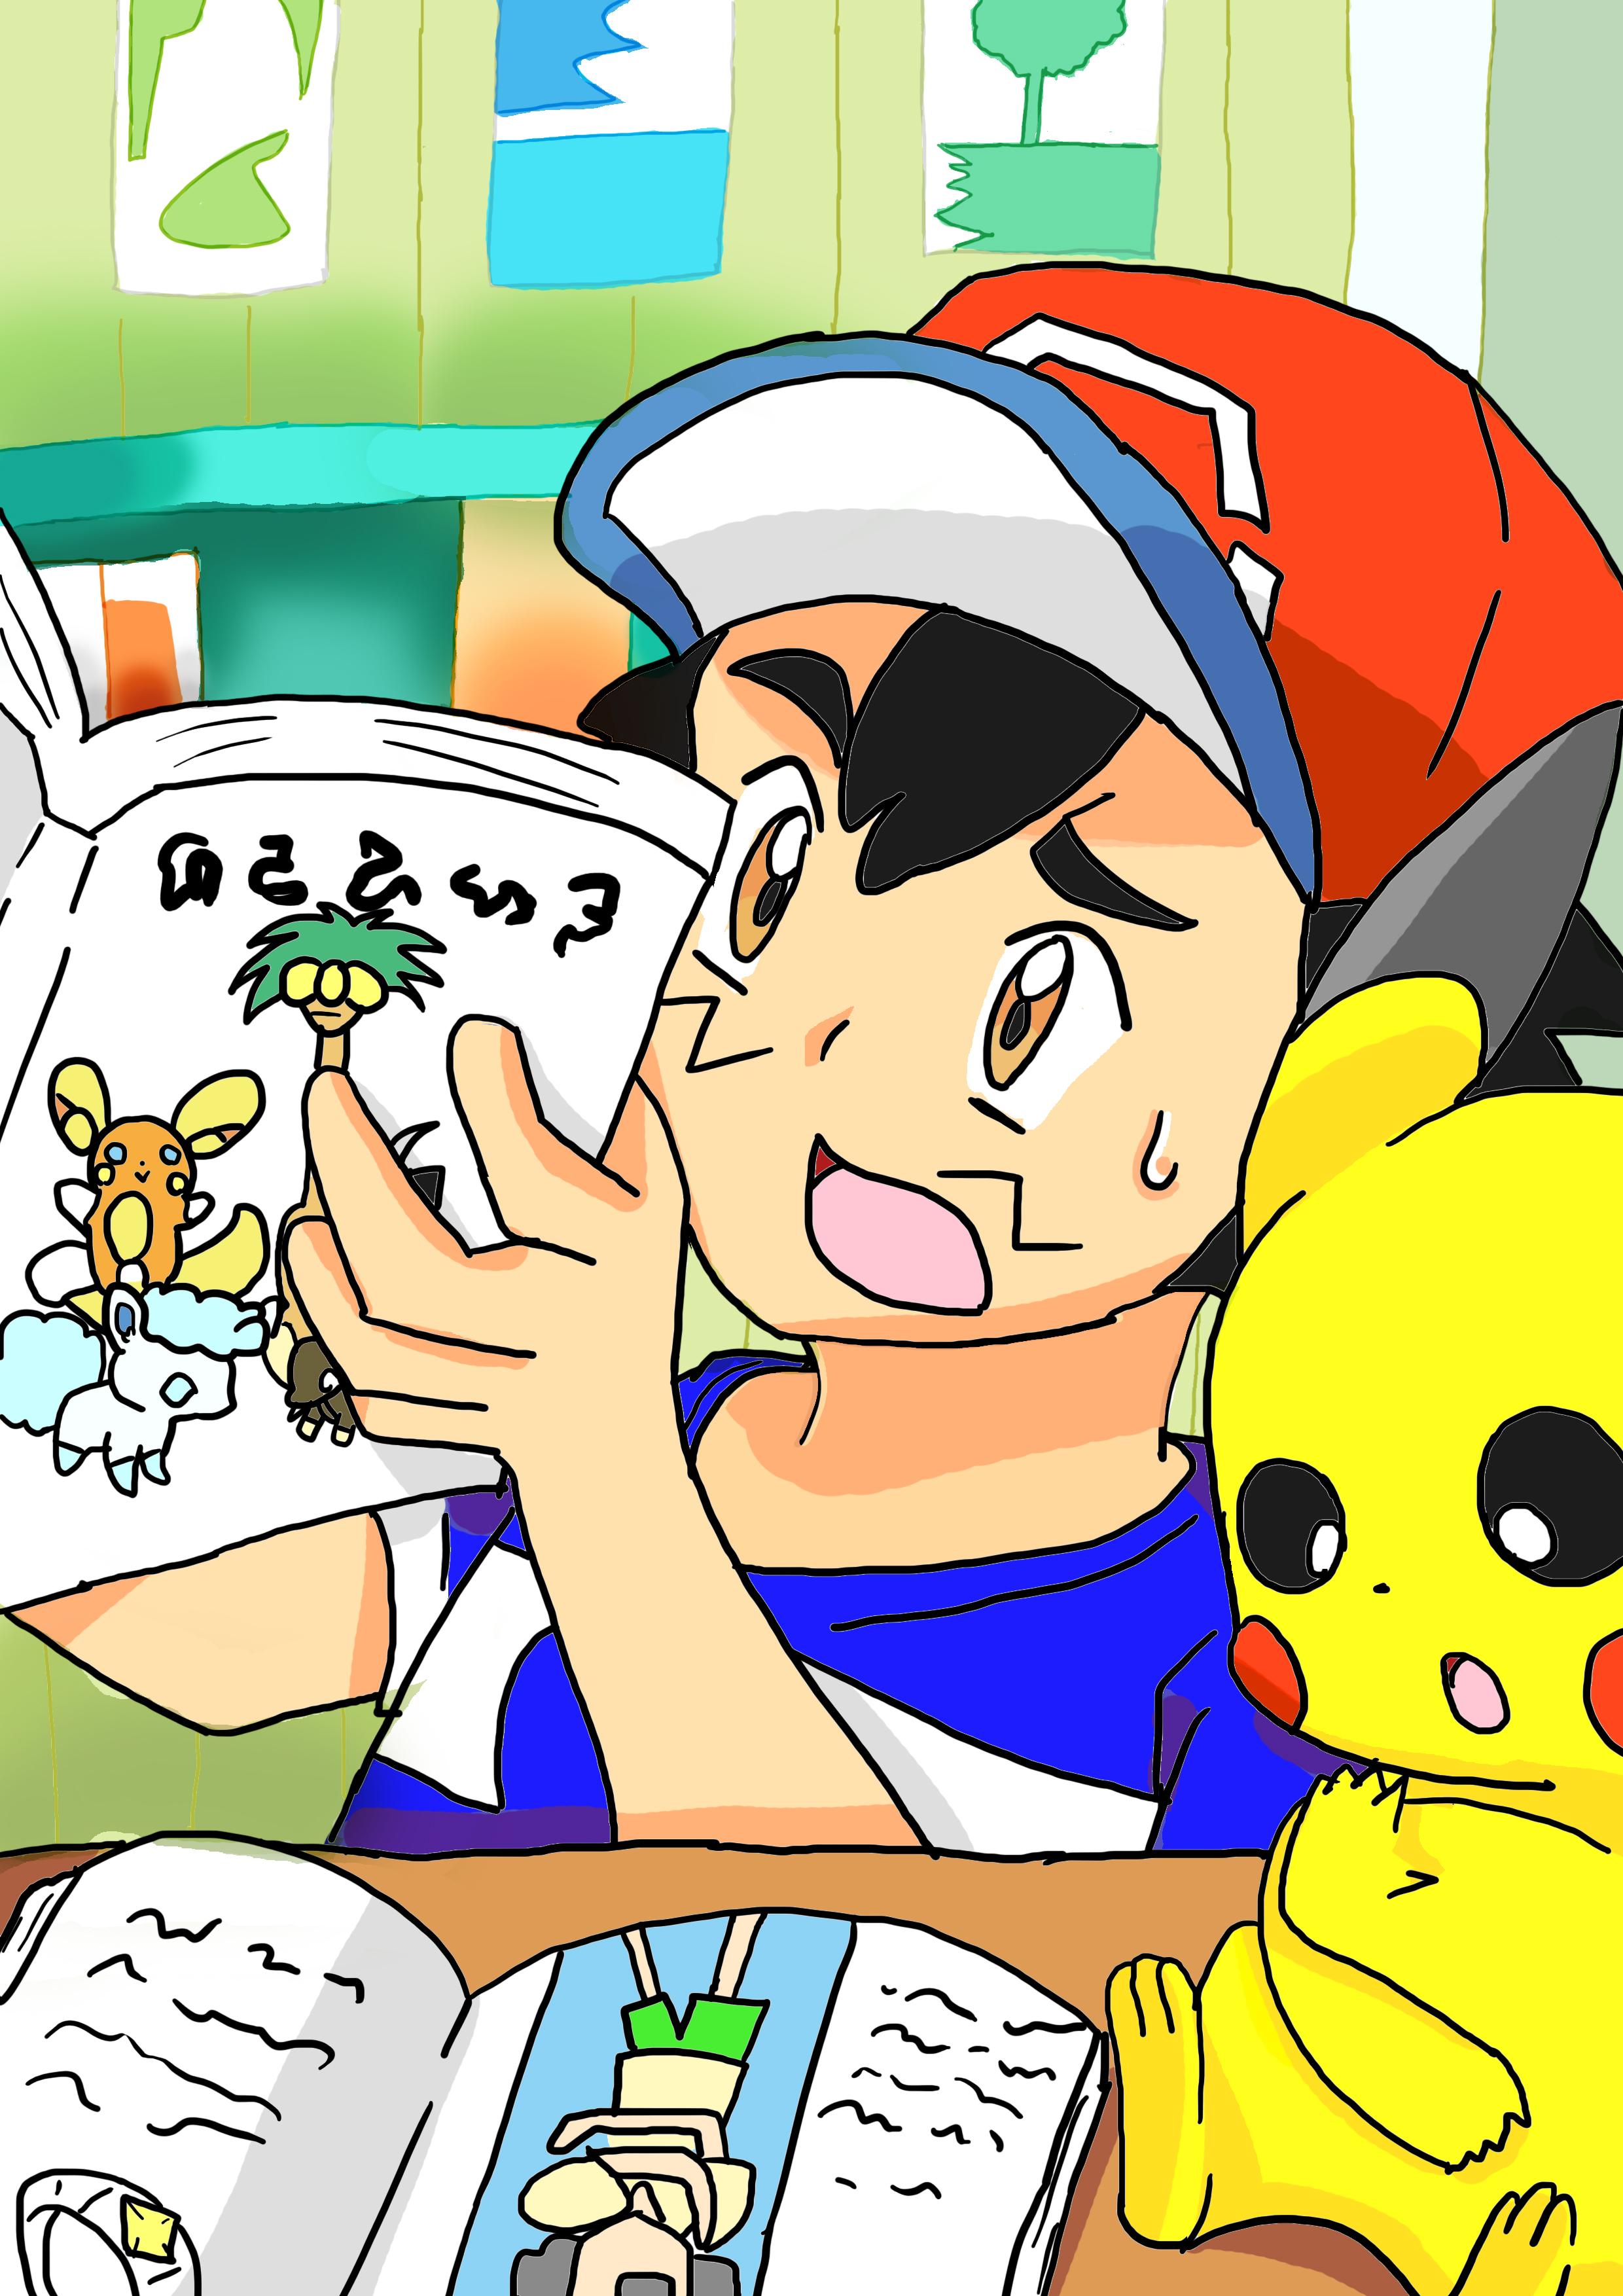 ash having an hard time studying at pokémon sun and moon